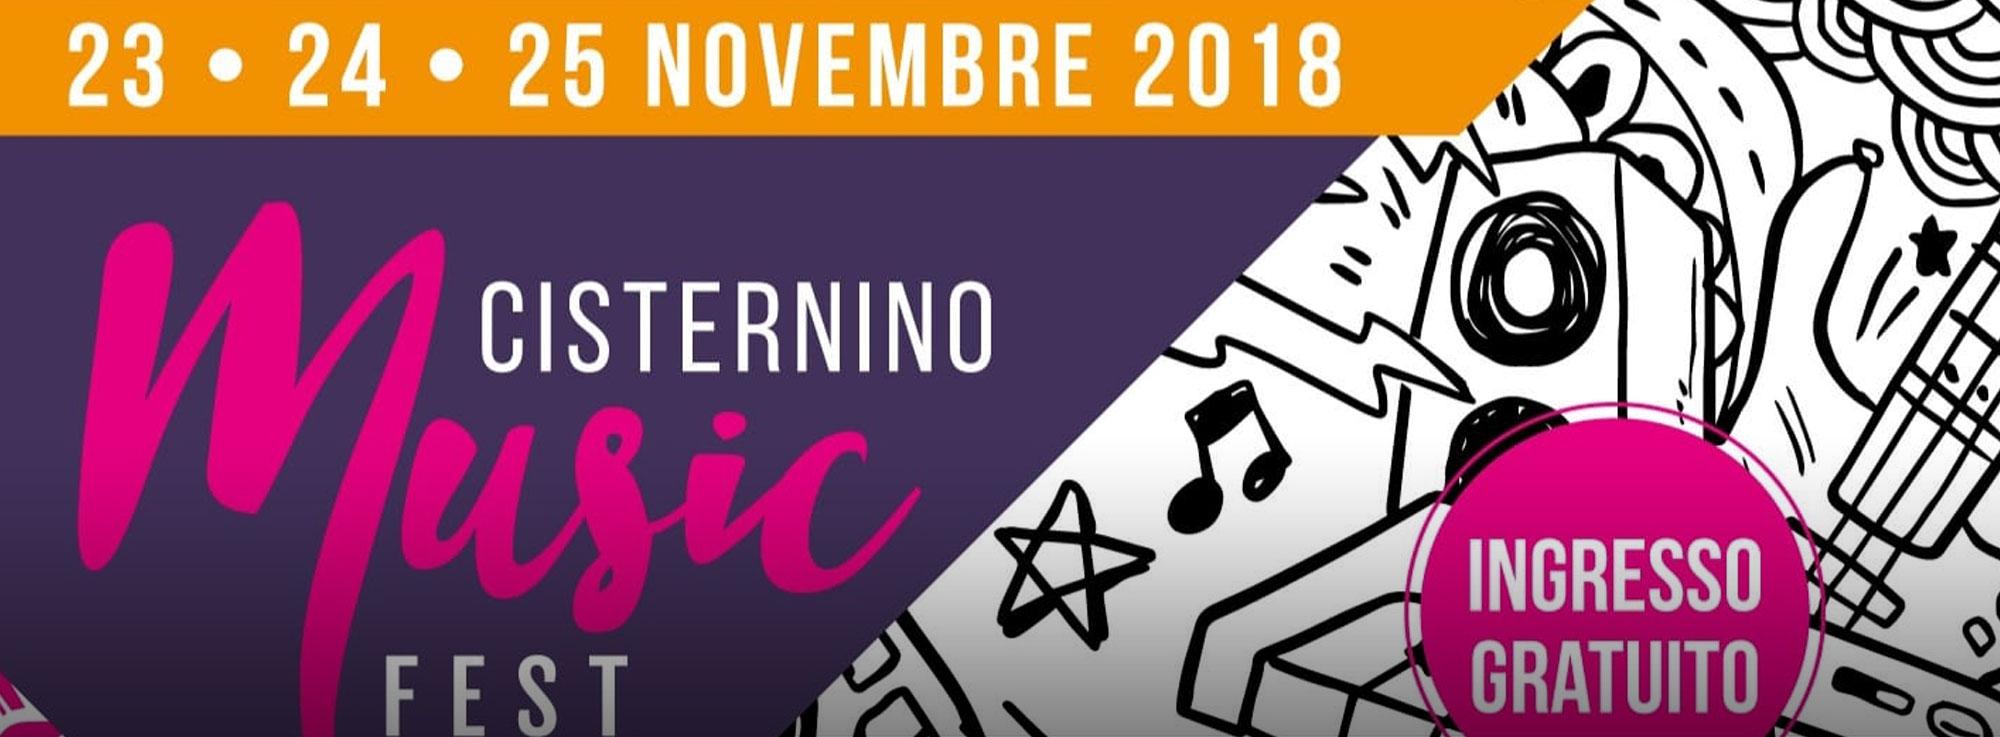 Cisternino: Cisternino Music Fest